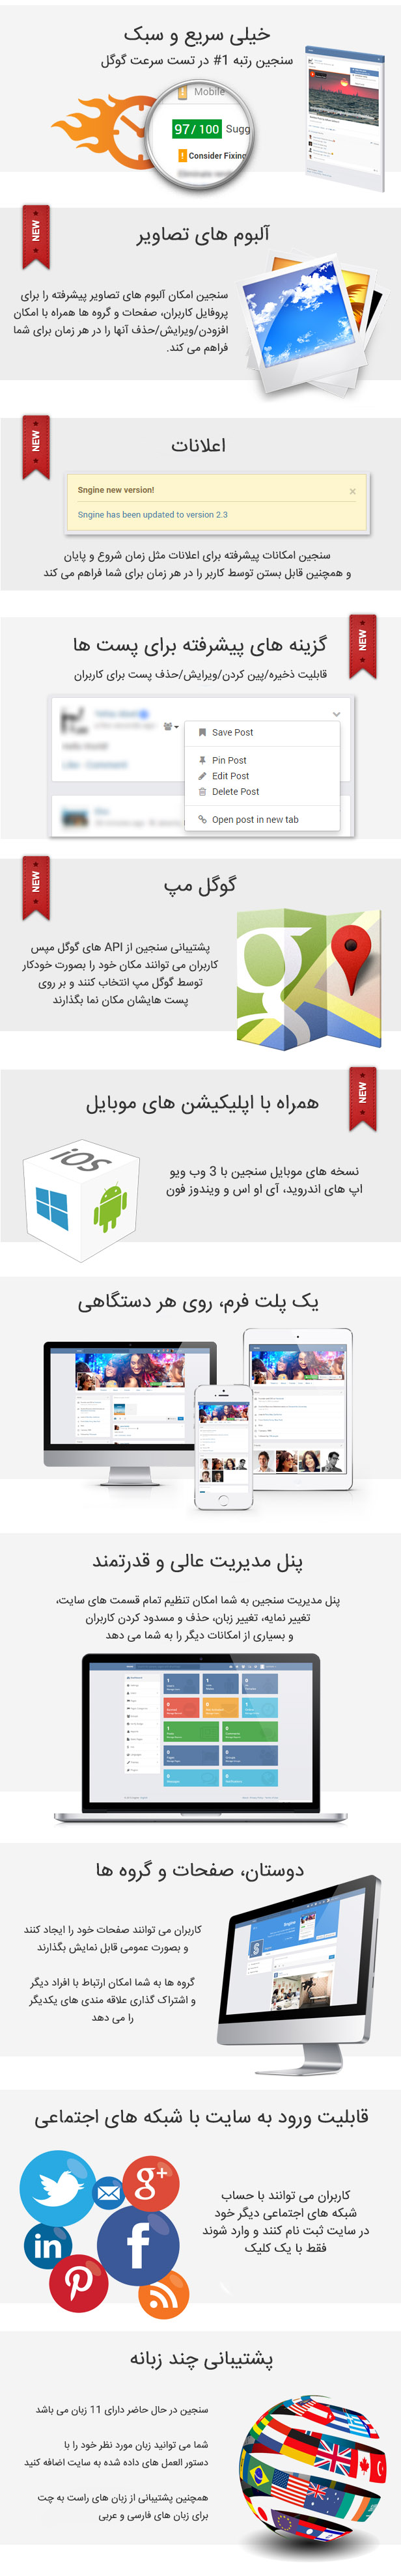 sngine feathers 1 namaket jpg - اسکریپت شبکه اجتماعی سنجین فارسی